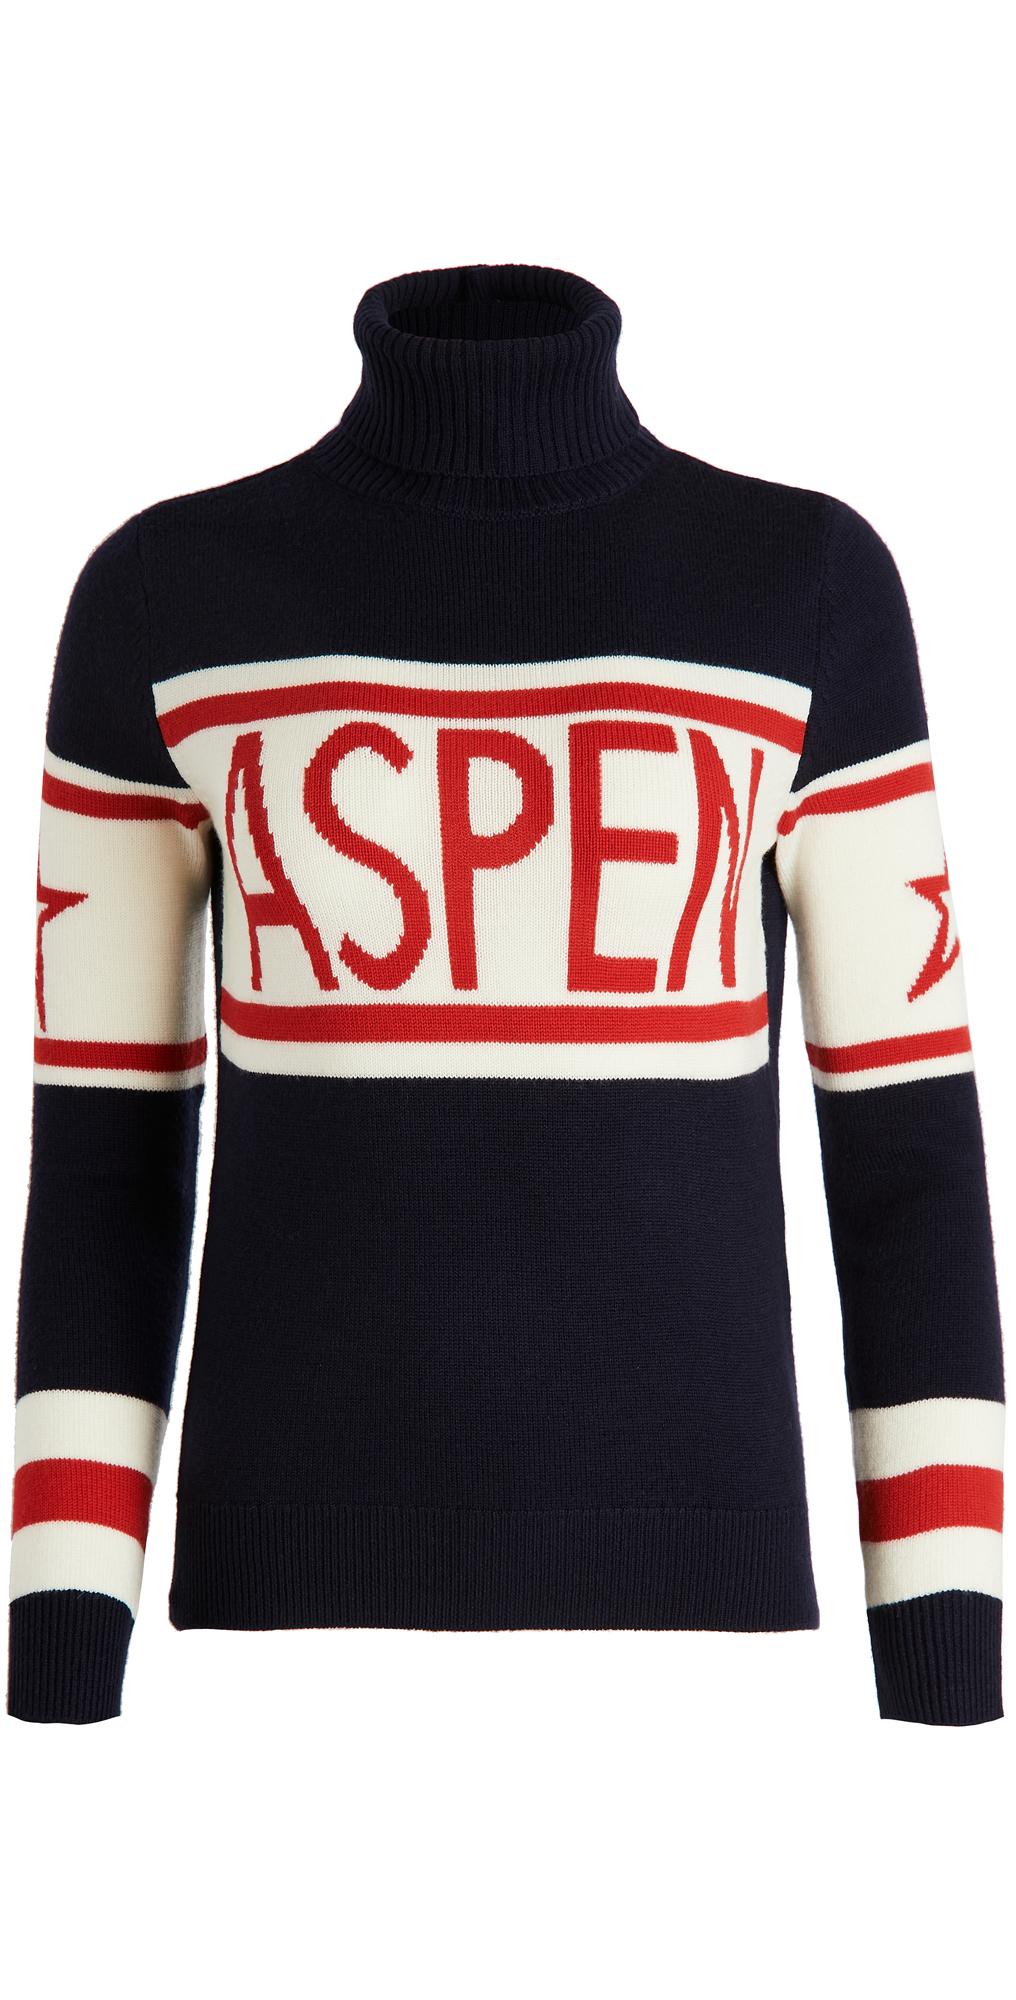 Perfect Moment Aspen Sweater